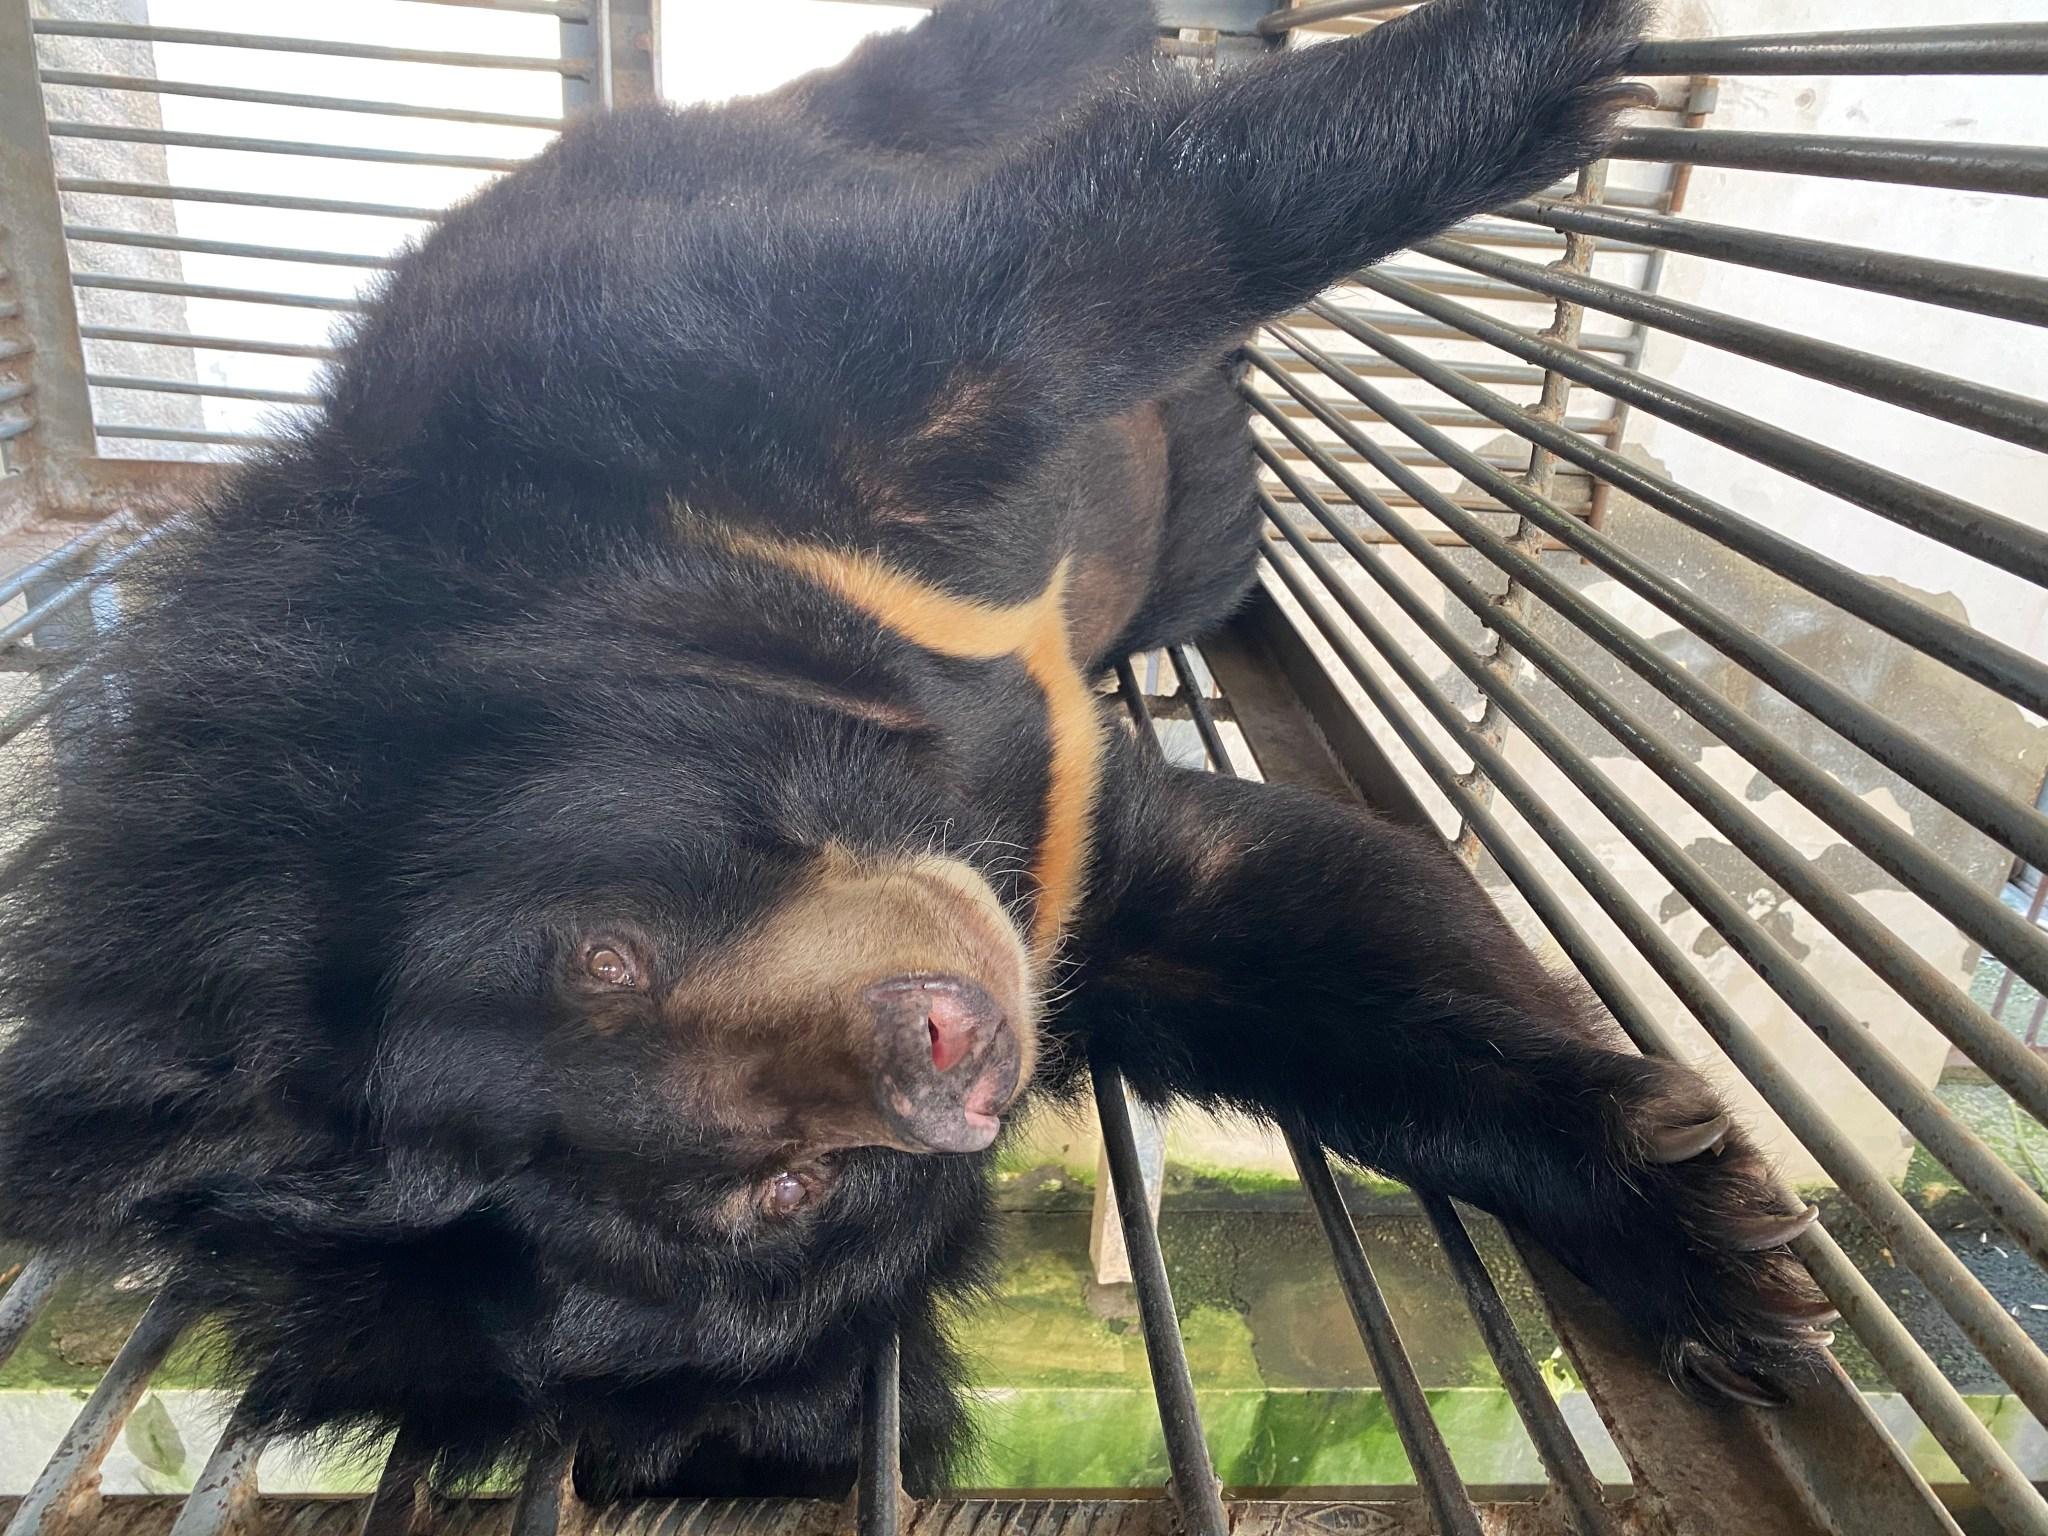 101 Bears Saved from Bear Bile Farms